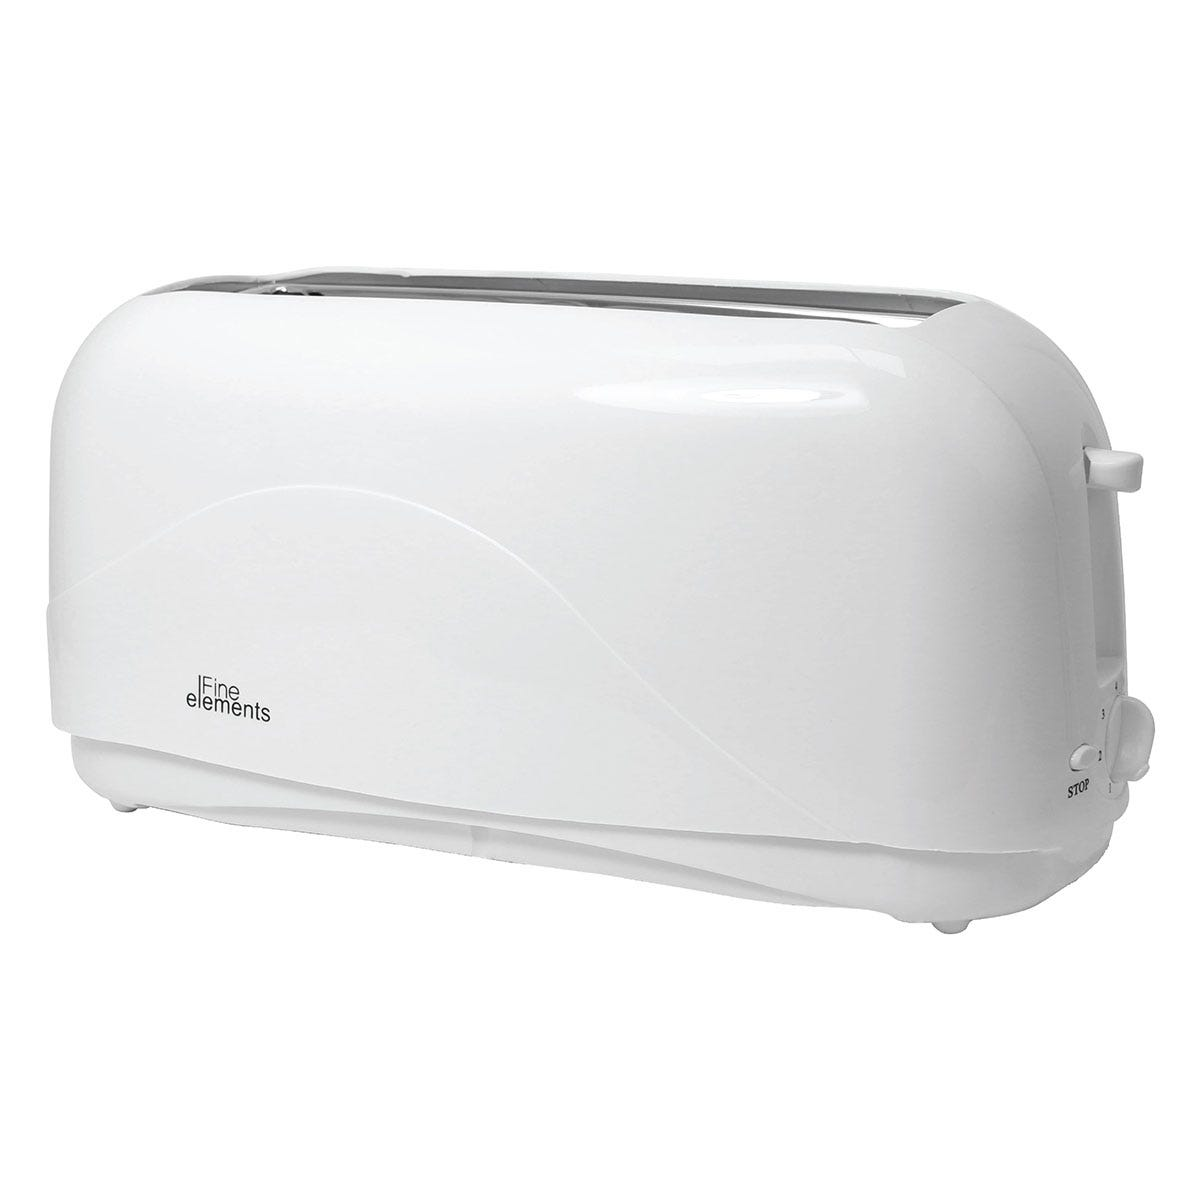 Fine Elements SDA1011GE Long 4-Slice Toaster - Pure White